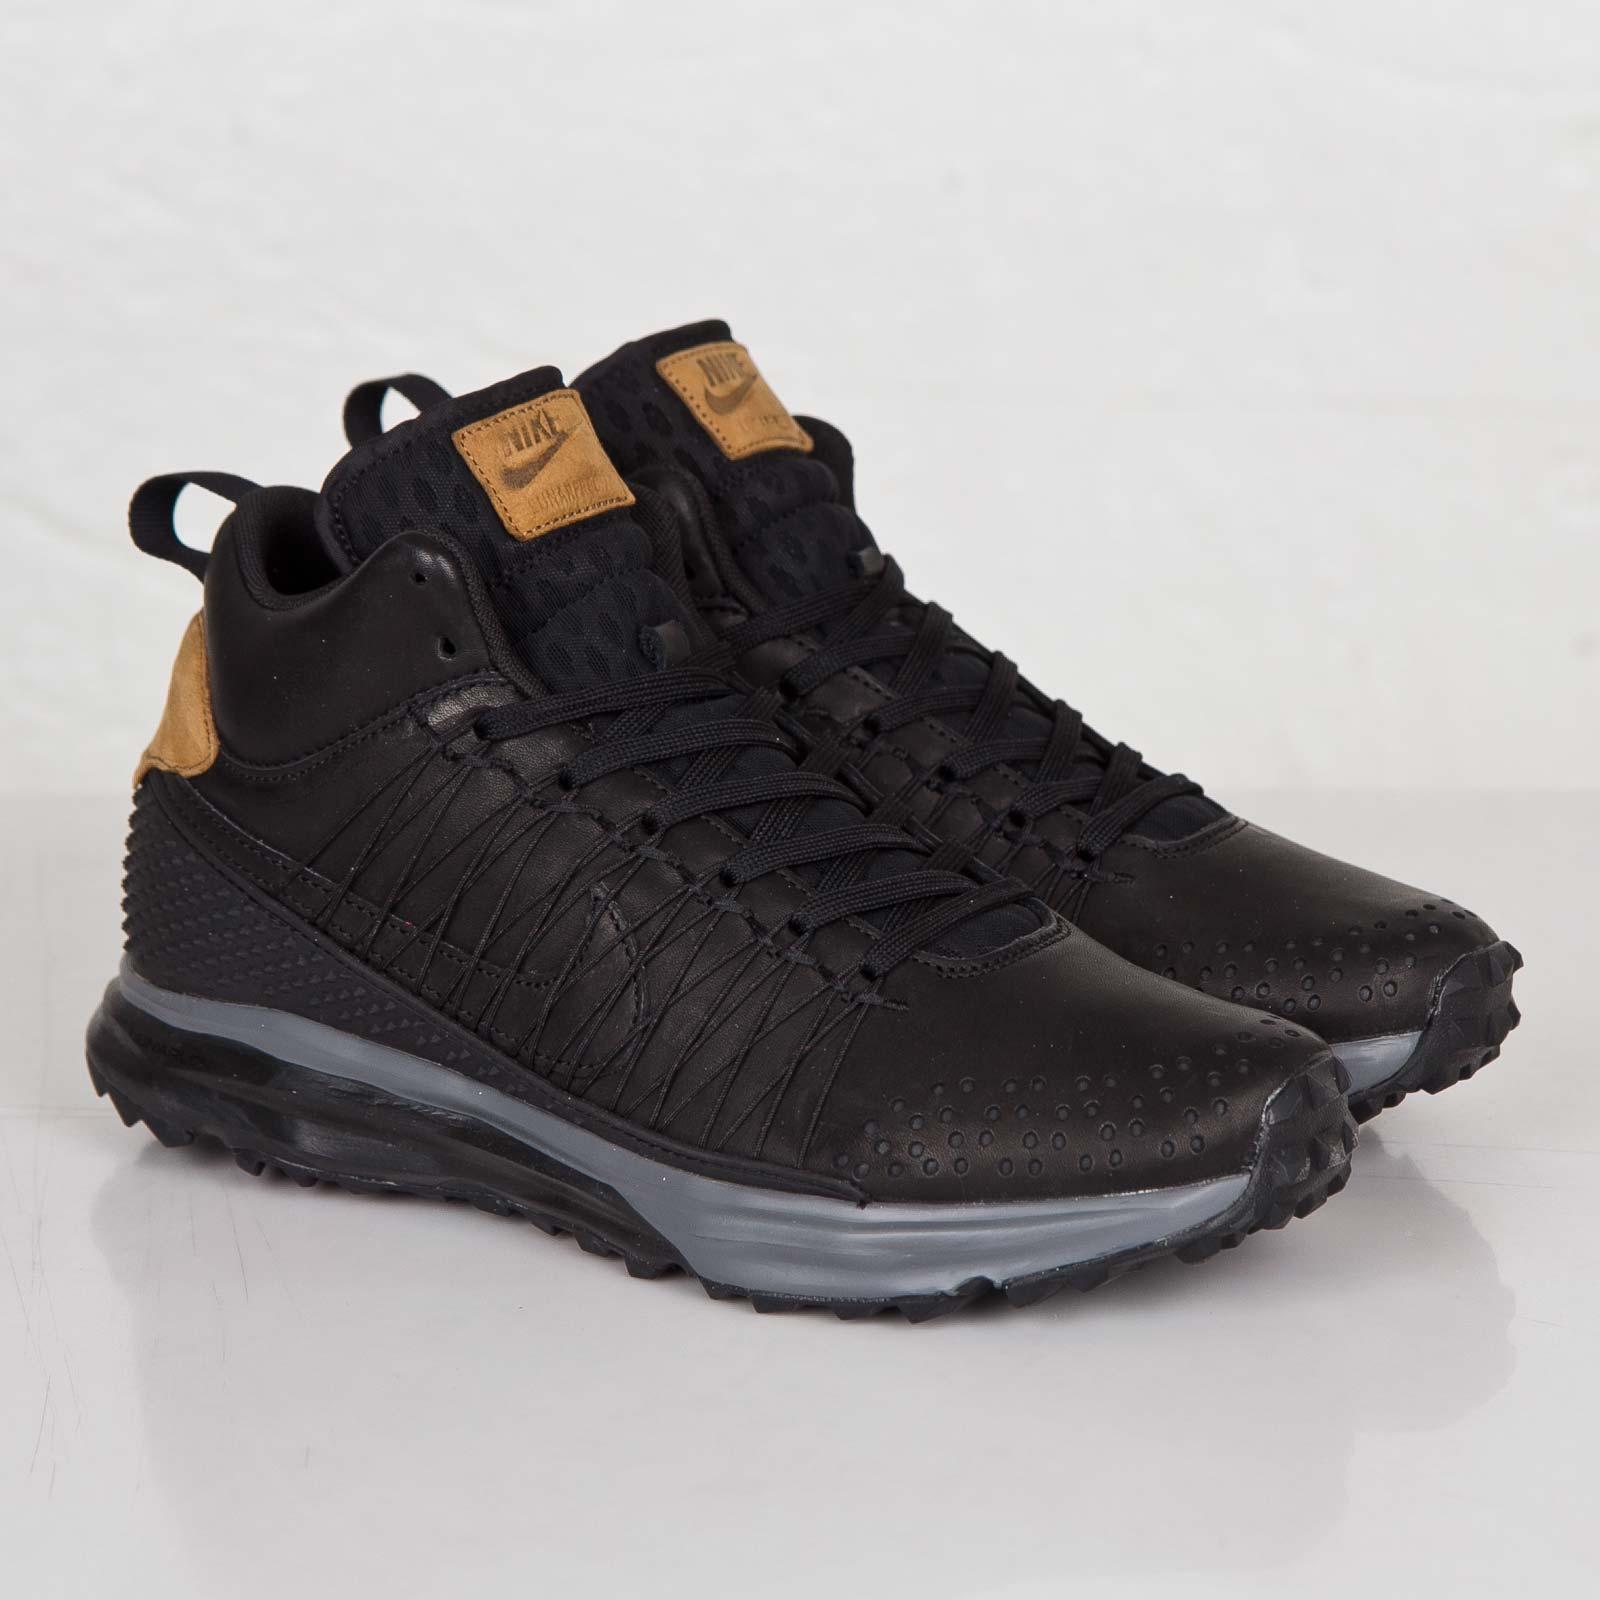 Nike Lunarfresh Sneakerboot QS - 723959